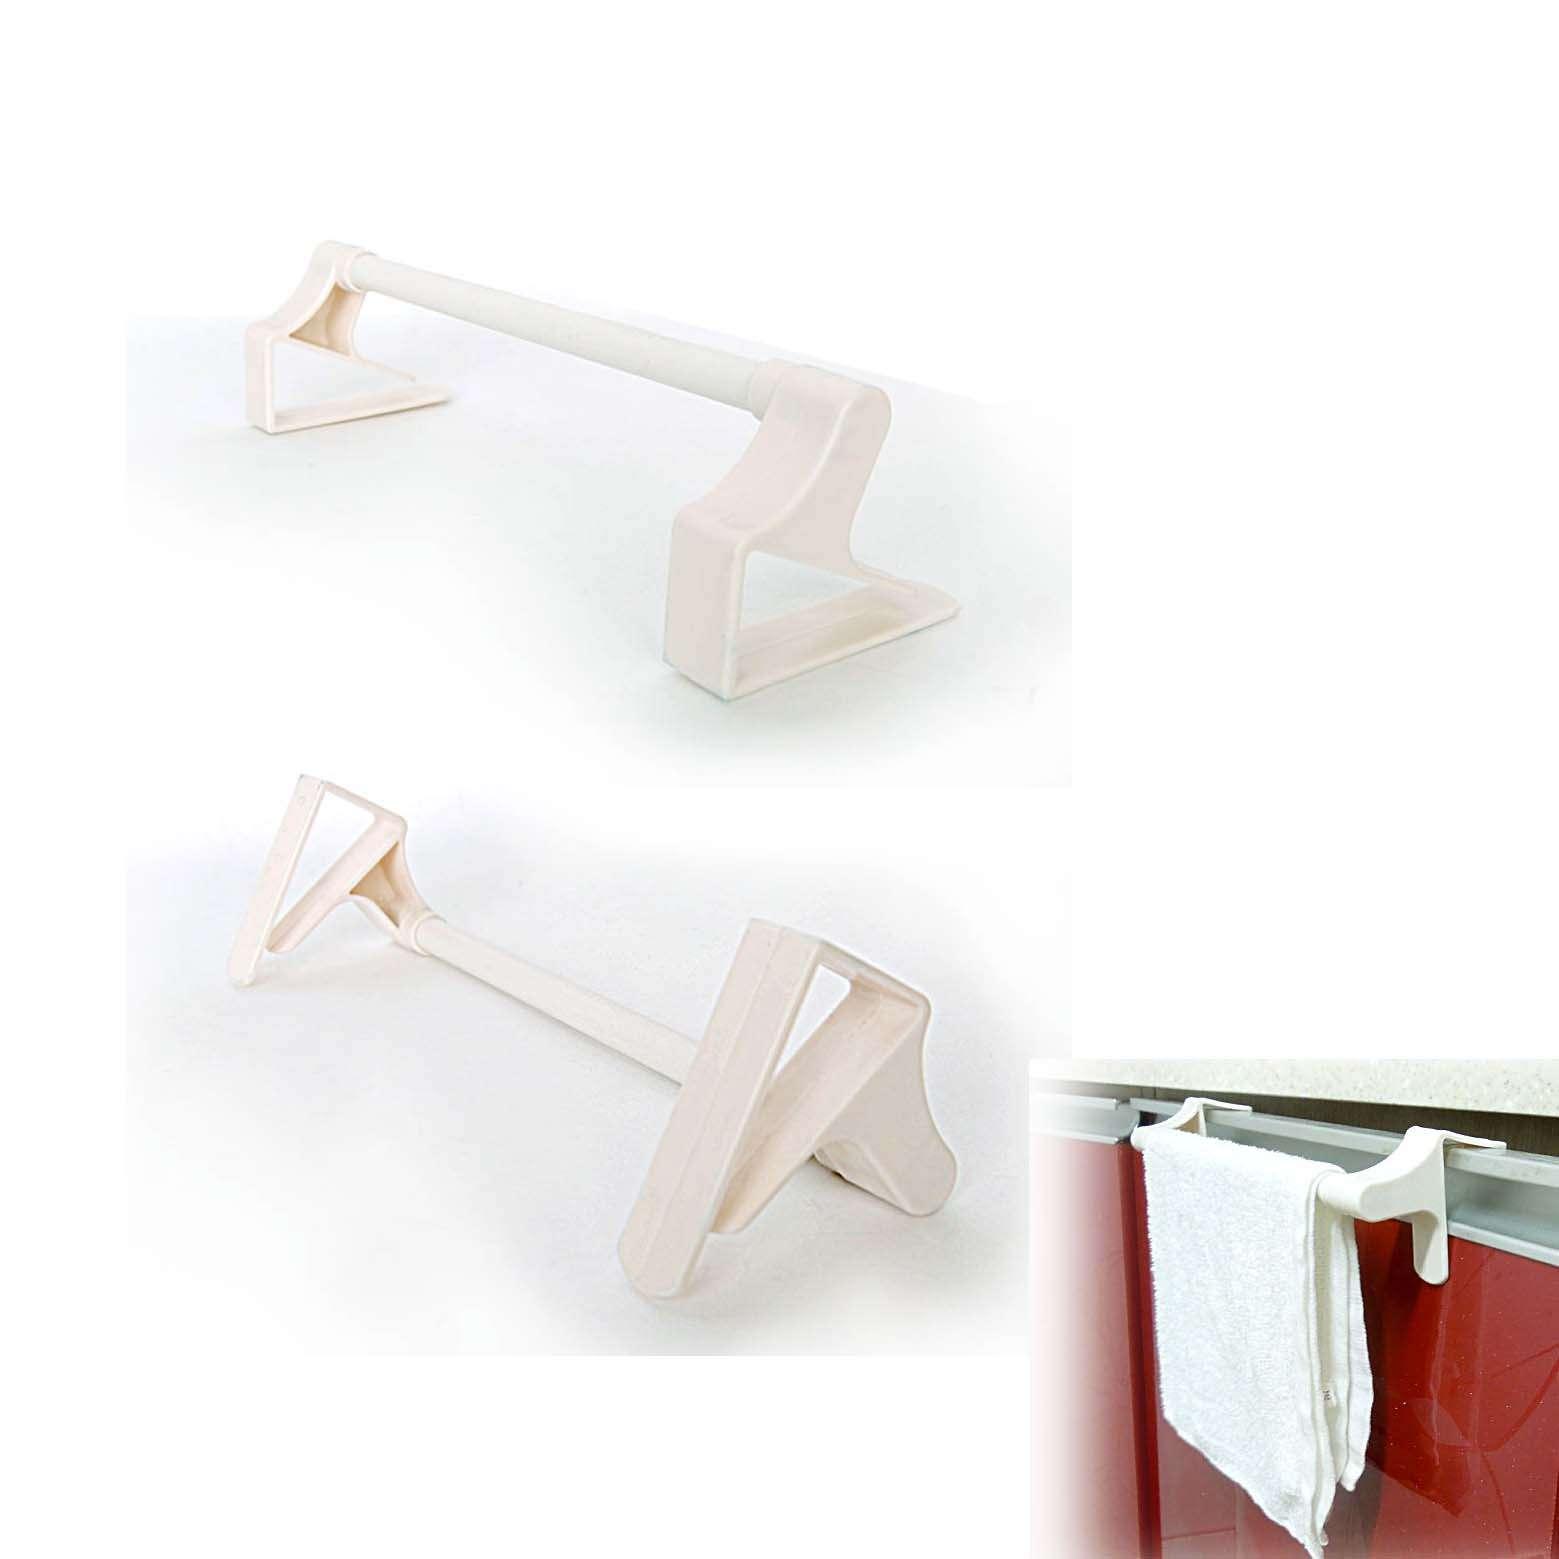 Dish Towel Stuck In Garbage Disposal: New Kitchen Towel Hook Bar For Under Sink Cabinet Doors